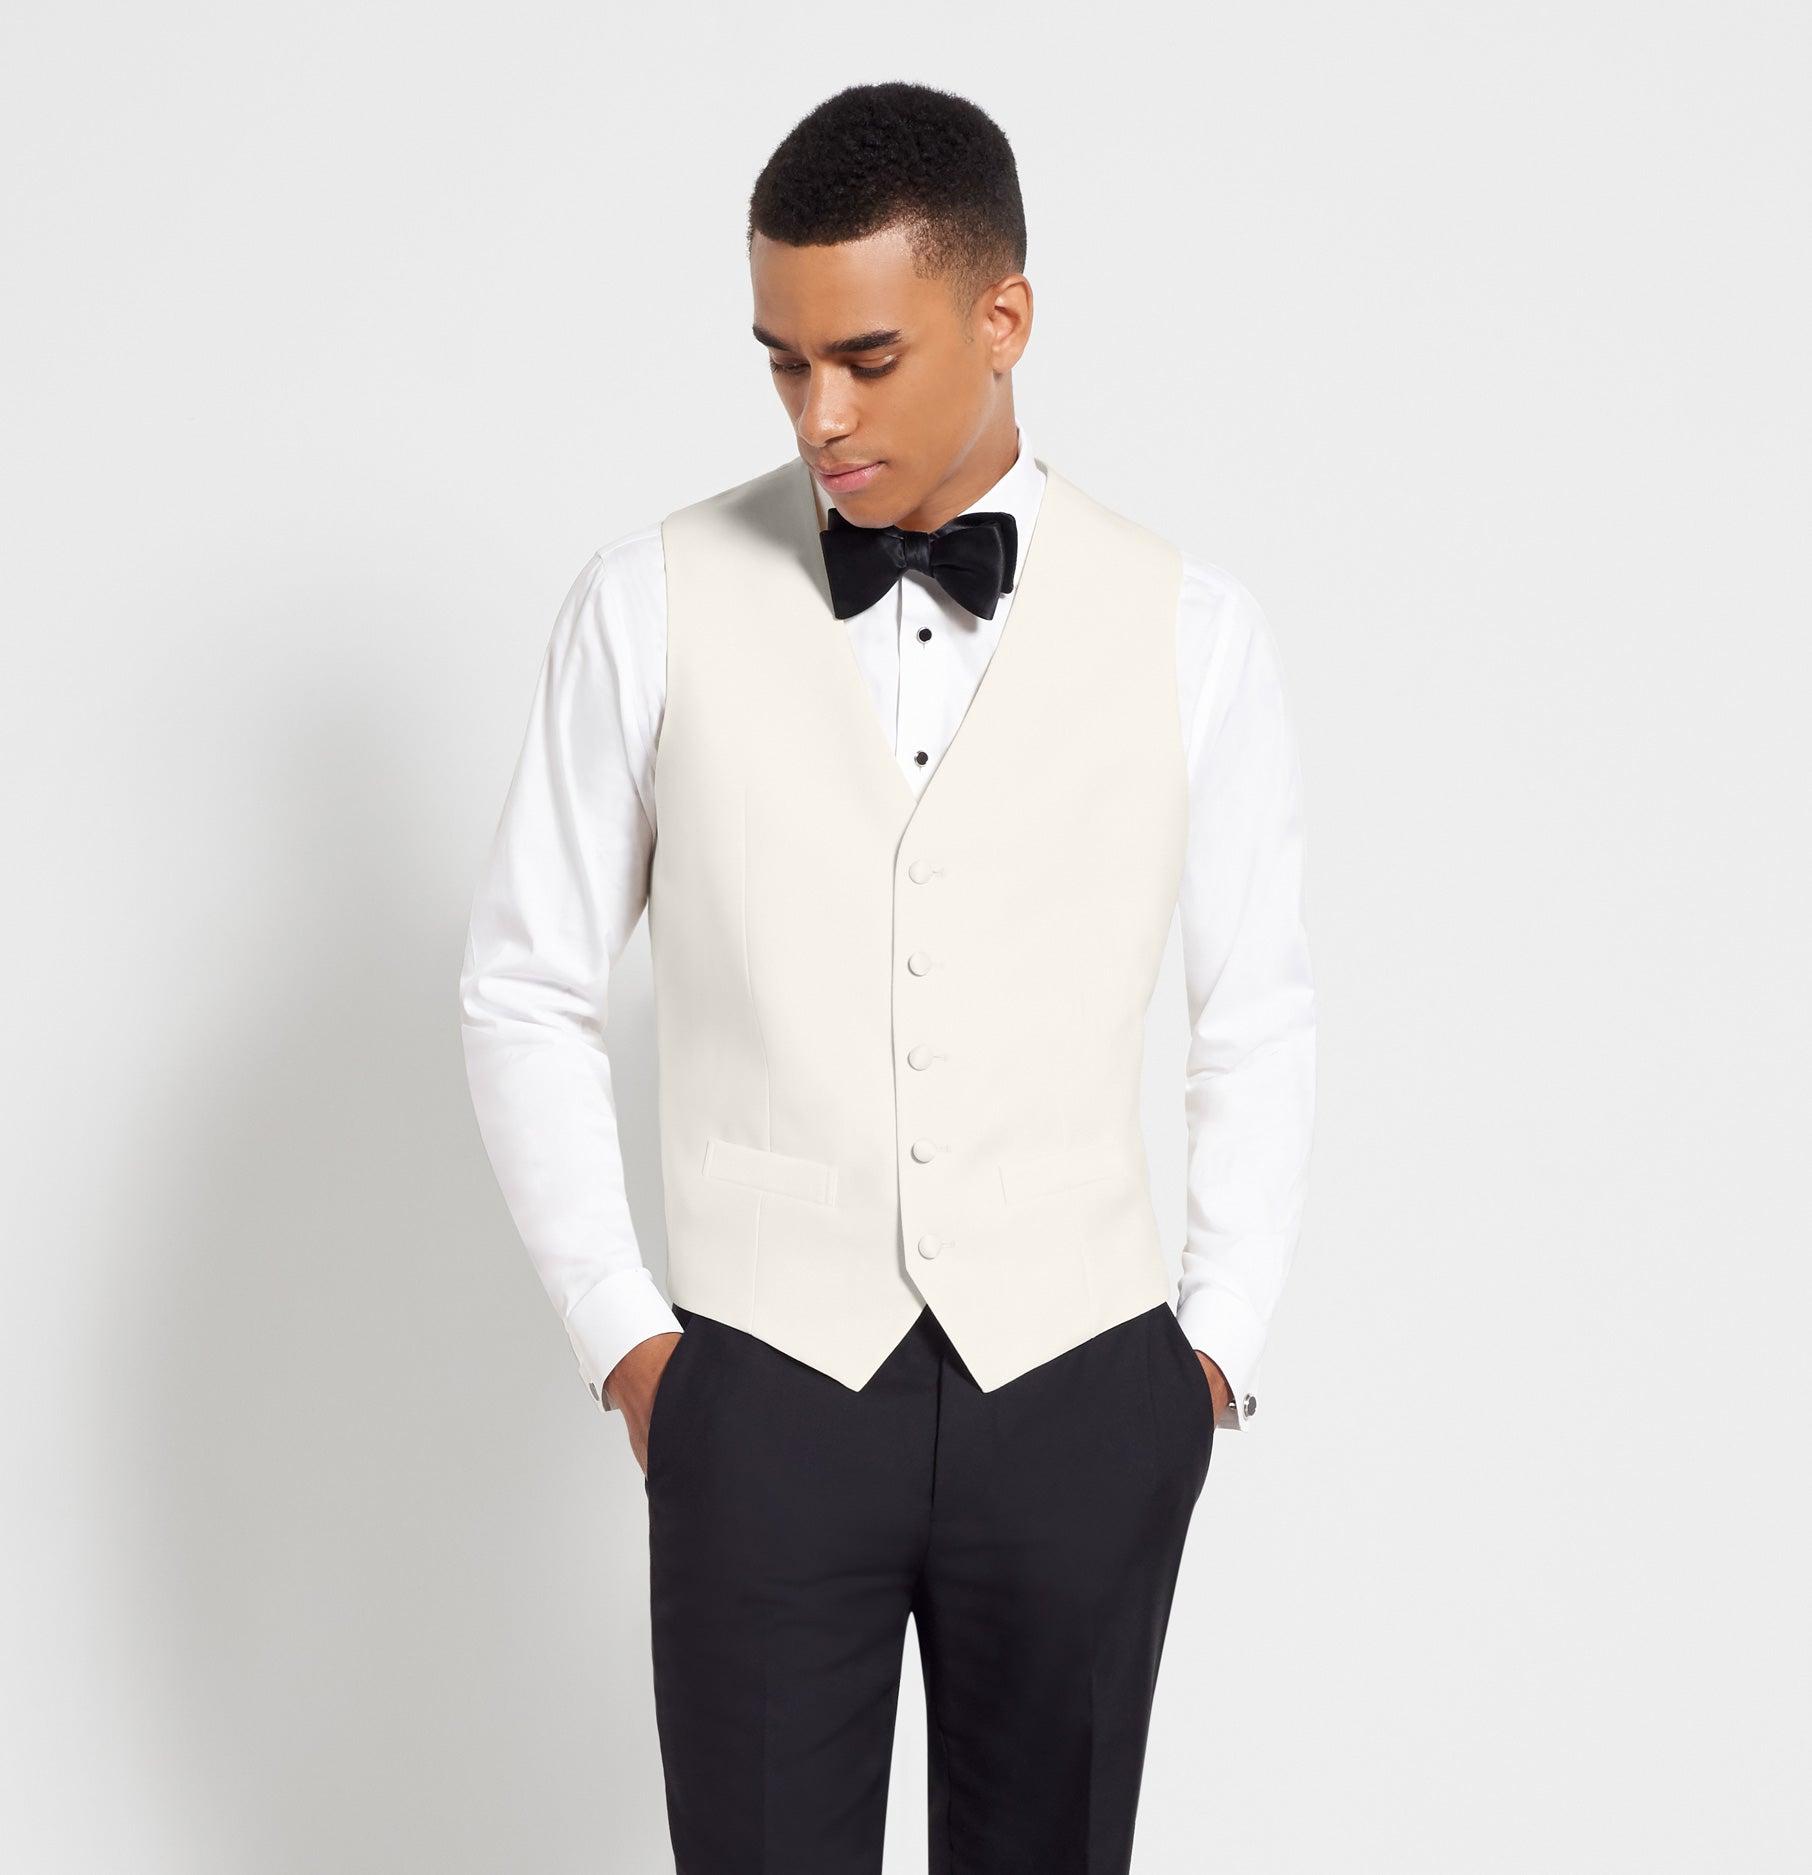 Ivory Satin Tuxedo Vest